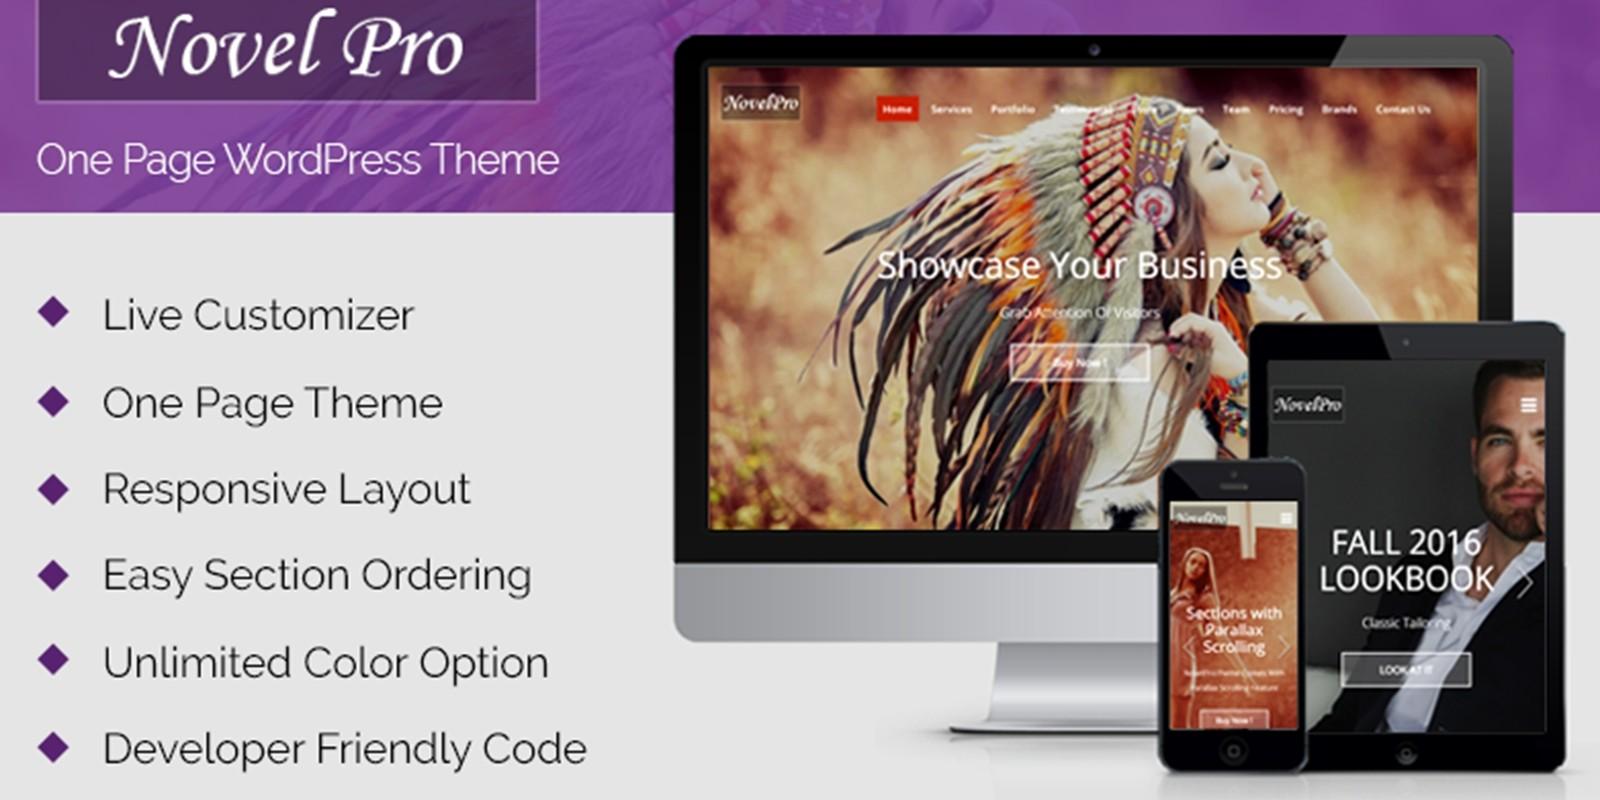 NovelPro - One Page WordPress Theme